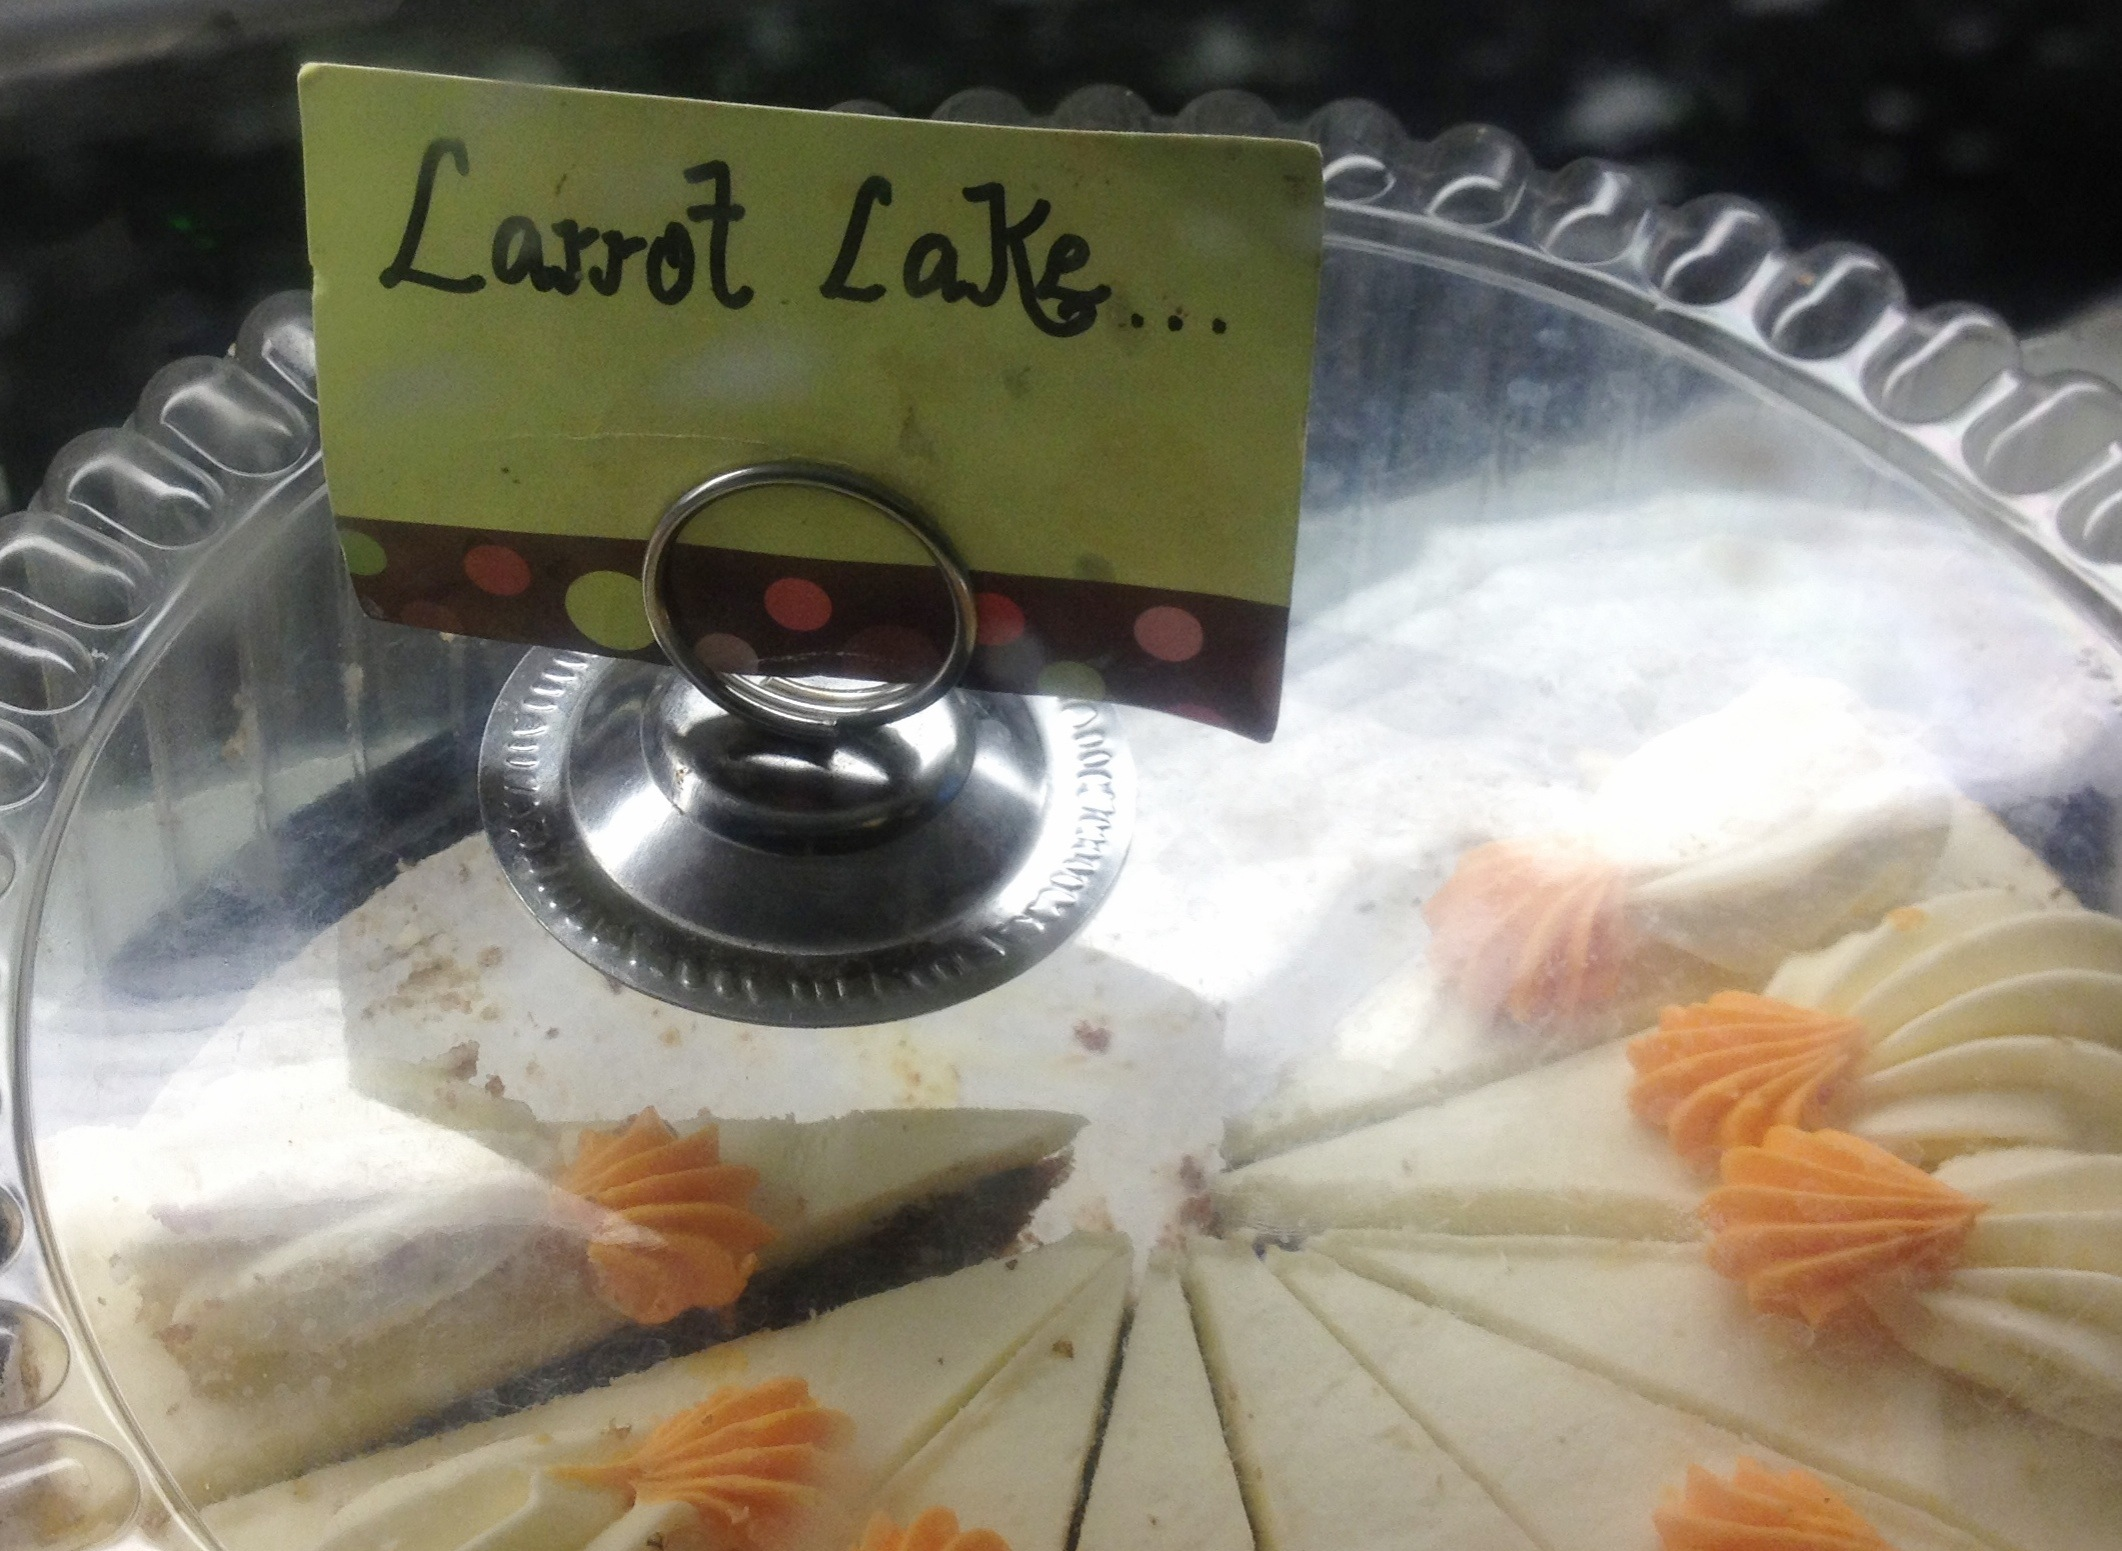 letrero que lee Larrot Lake